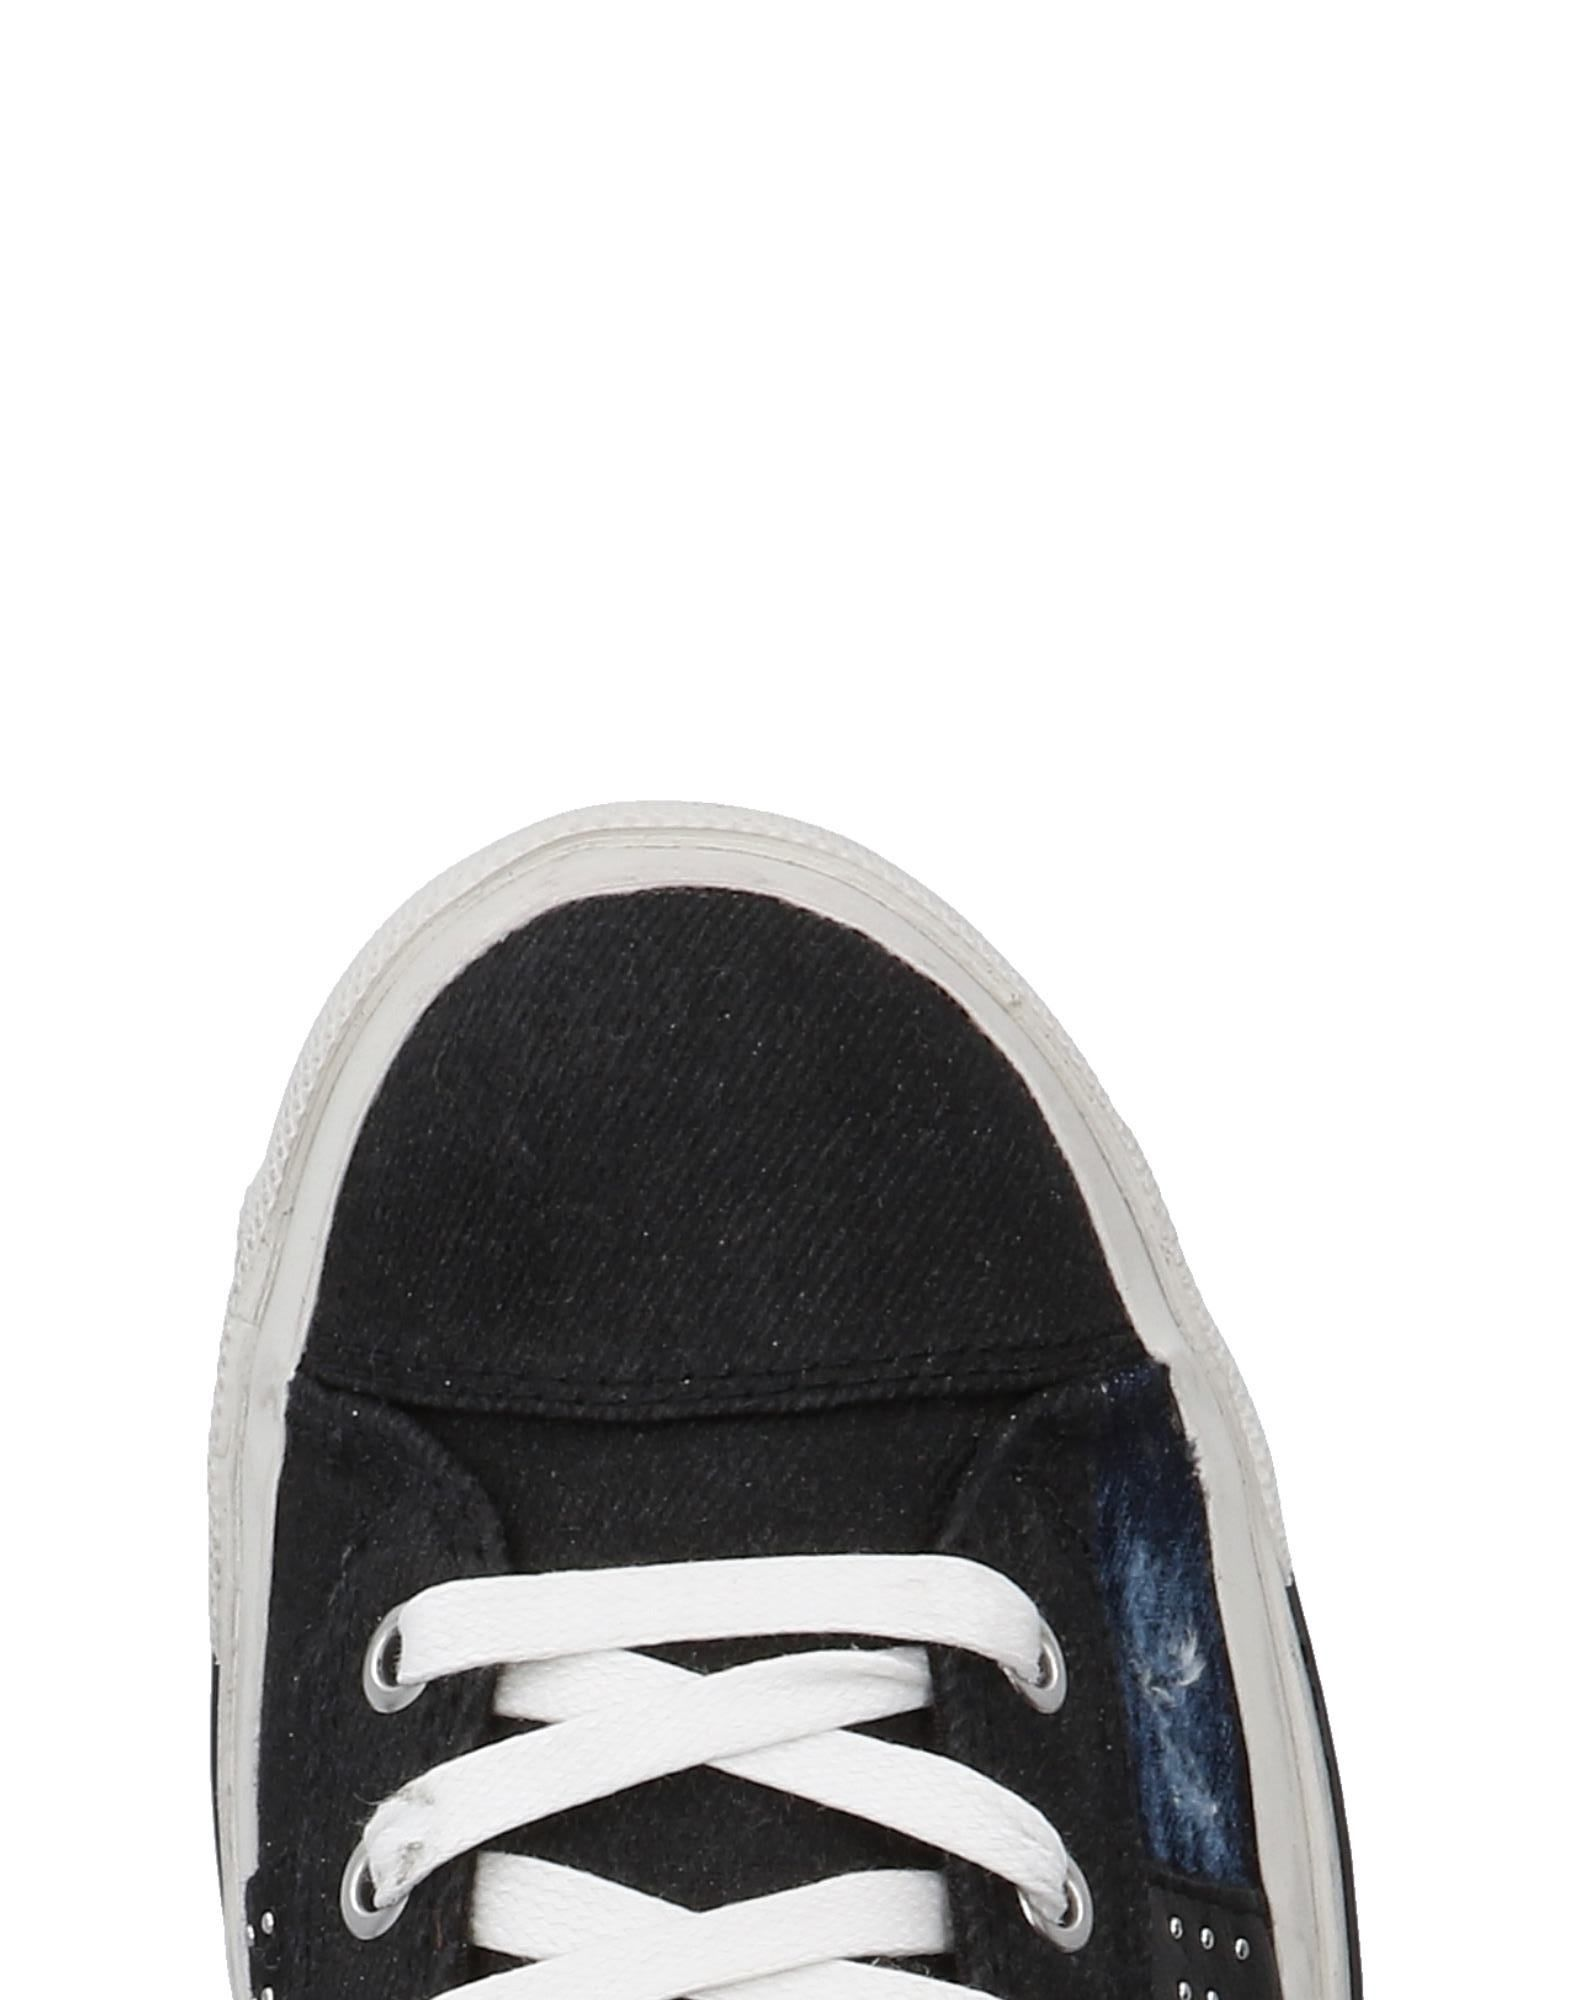 Diesel Sneakers Damen beliebte  11495446FH Gute Qualität beliebte Damen Schuhe 1199b9